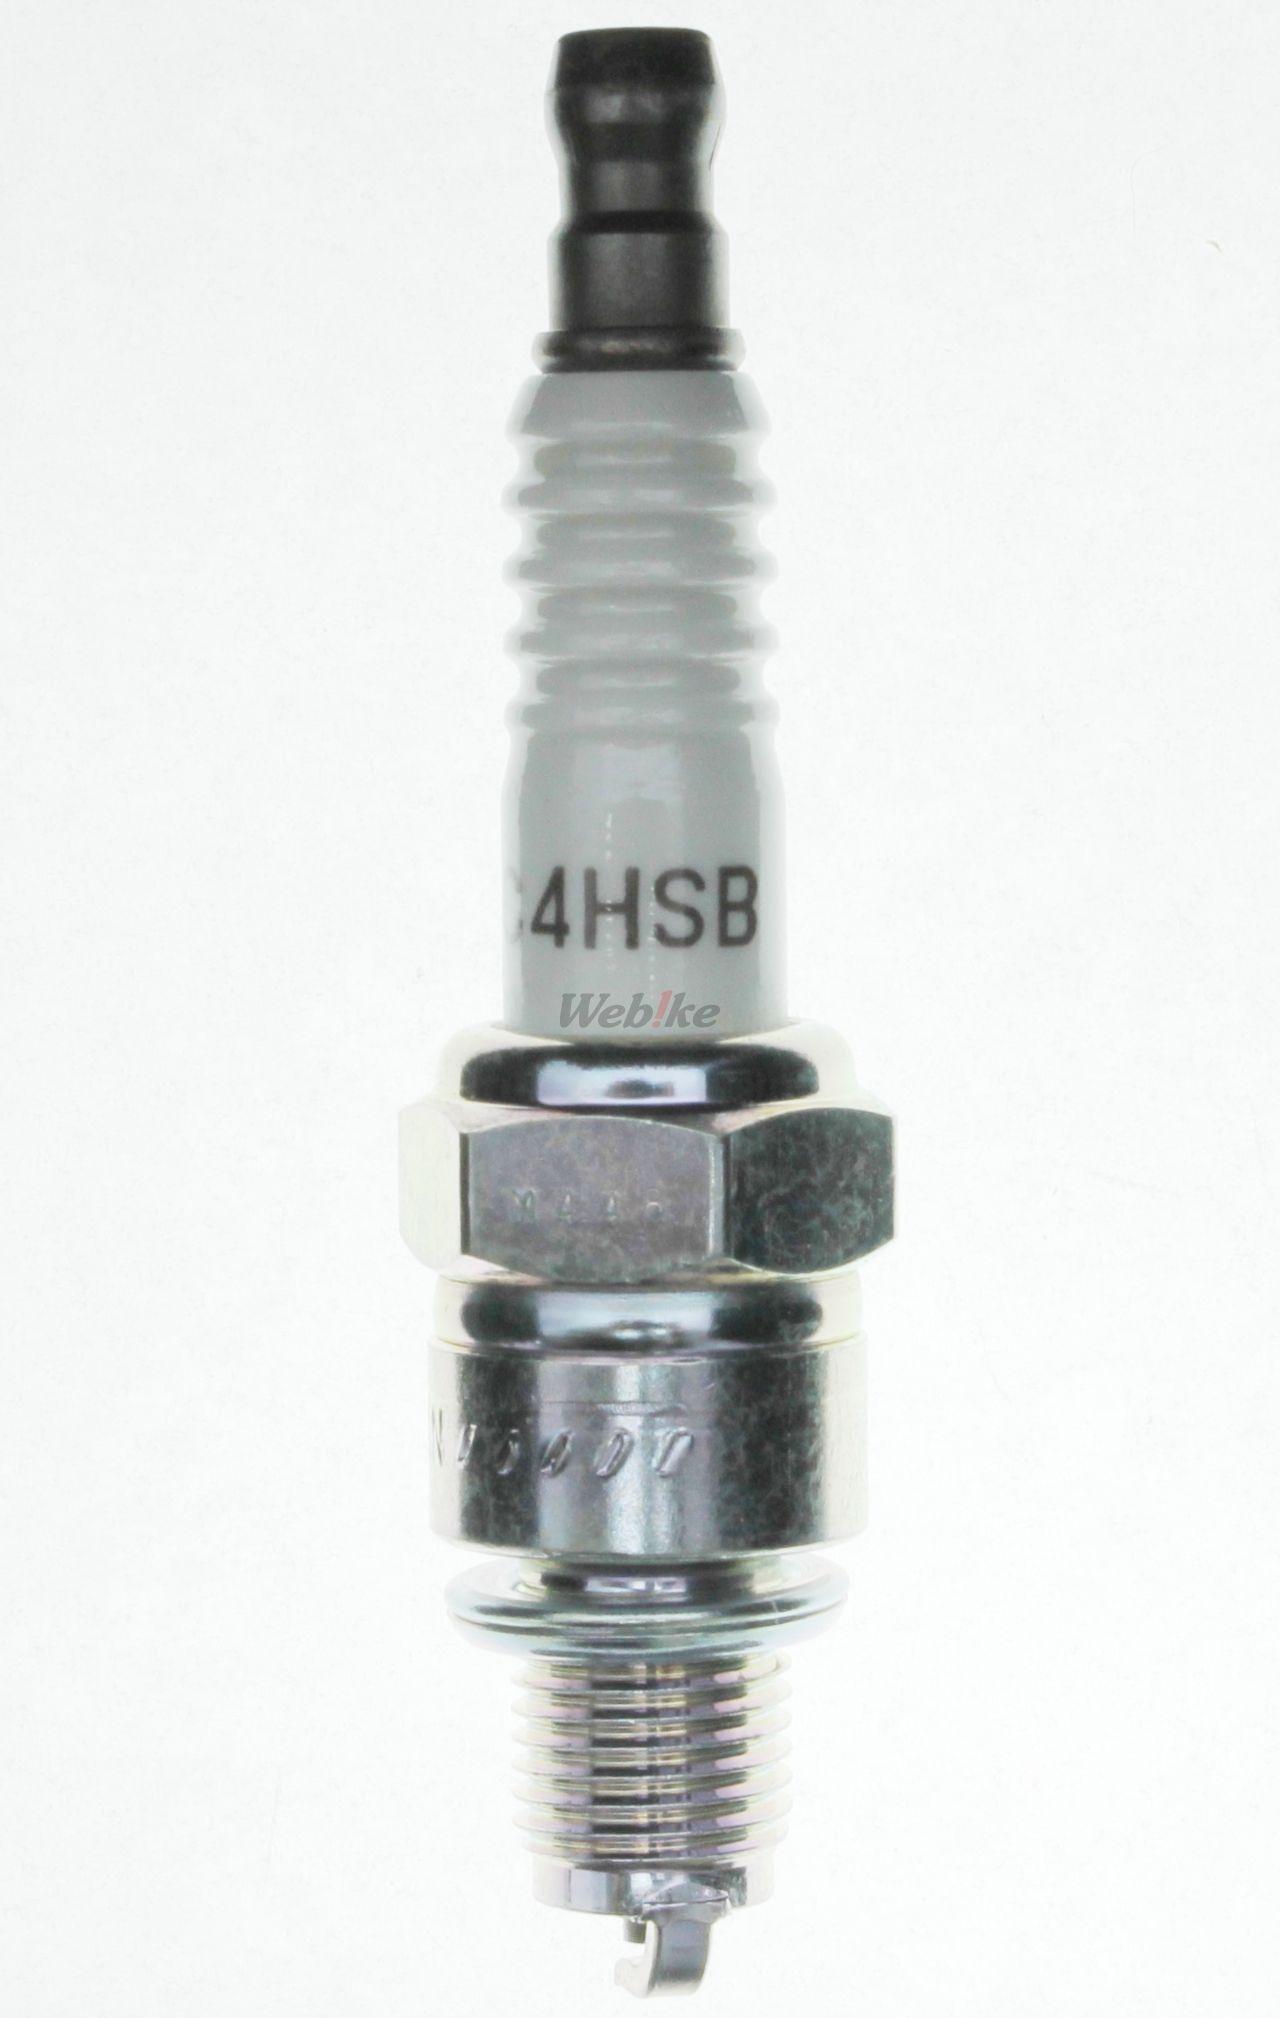 【NGK】標準型 火星塞 C4HSB 2409 - 「Webike-摩托百貨」